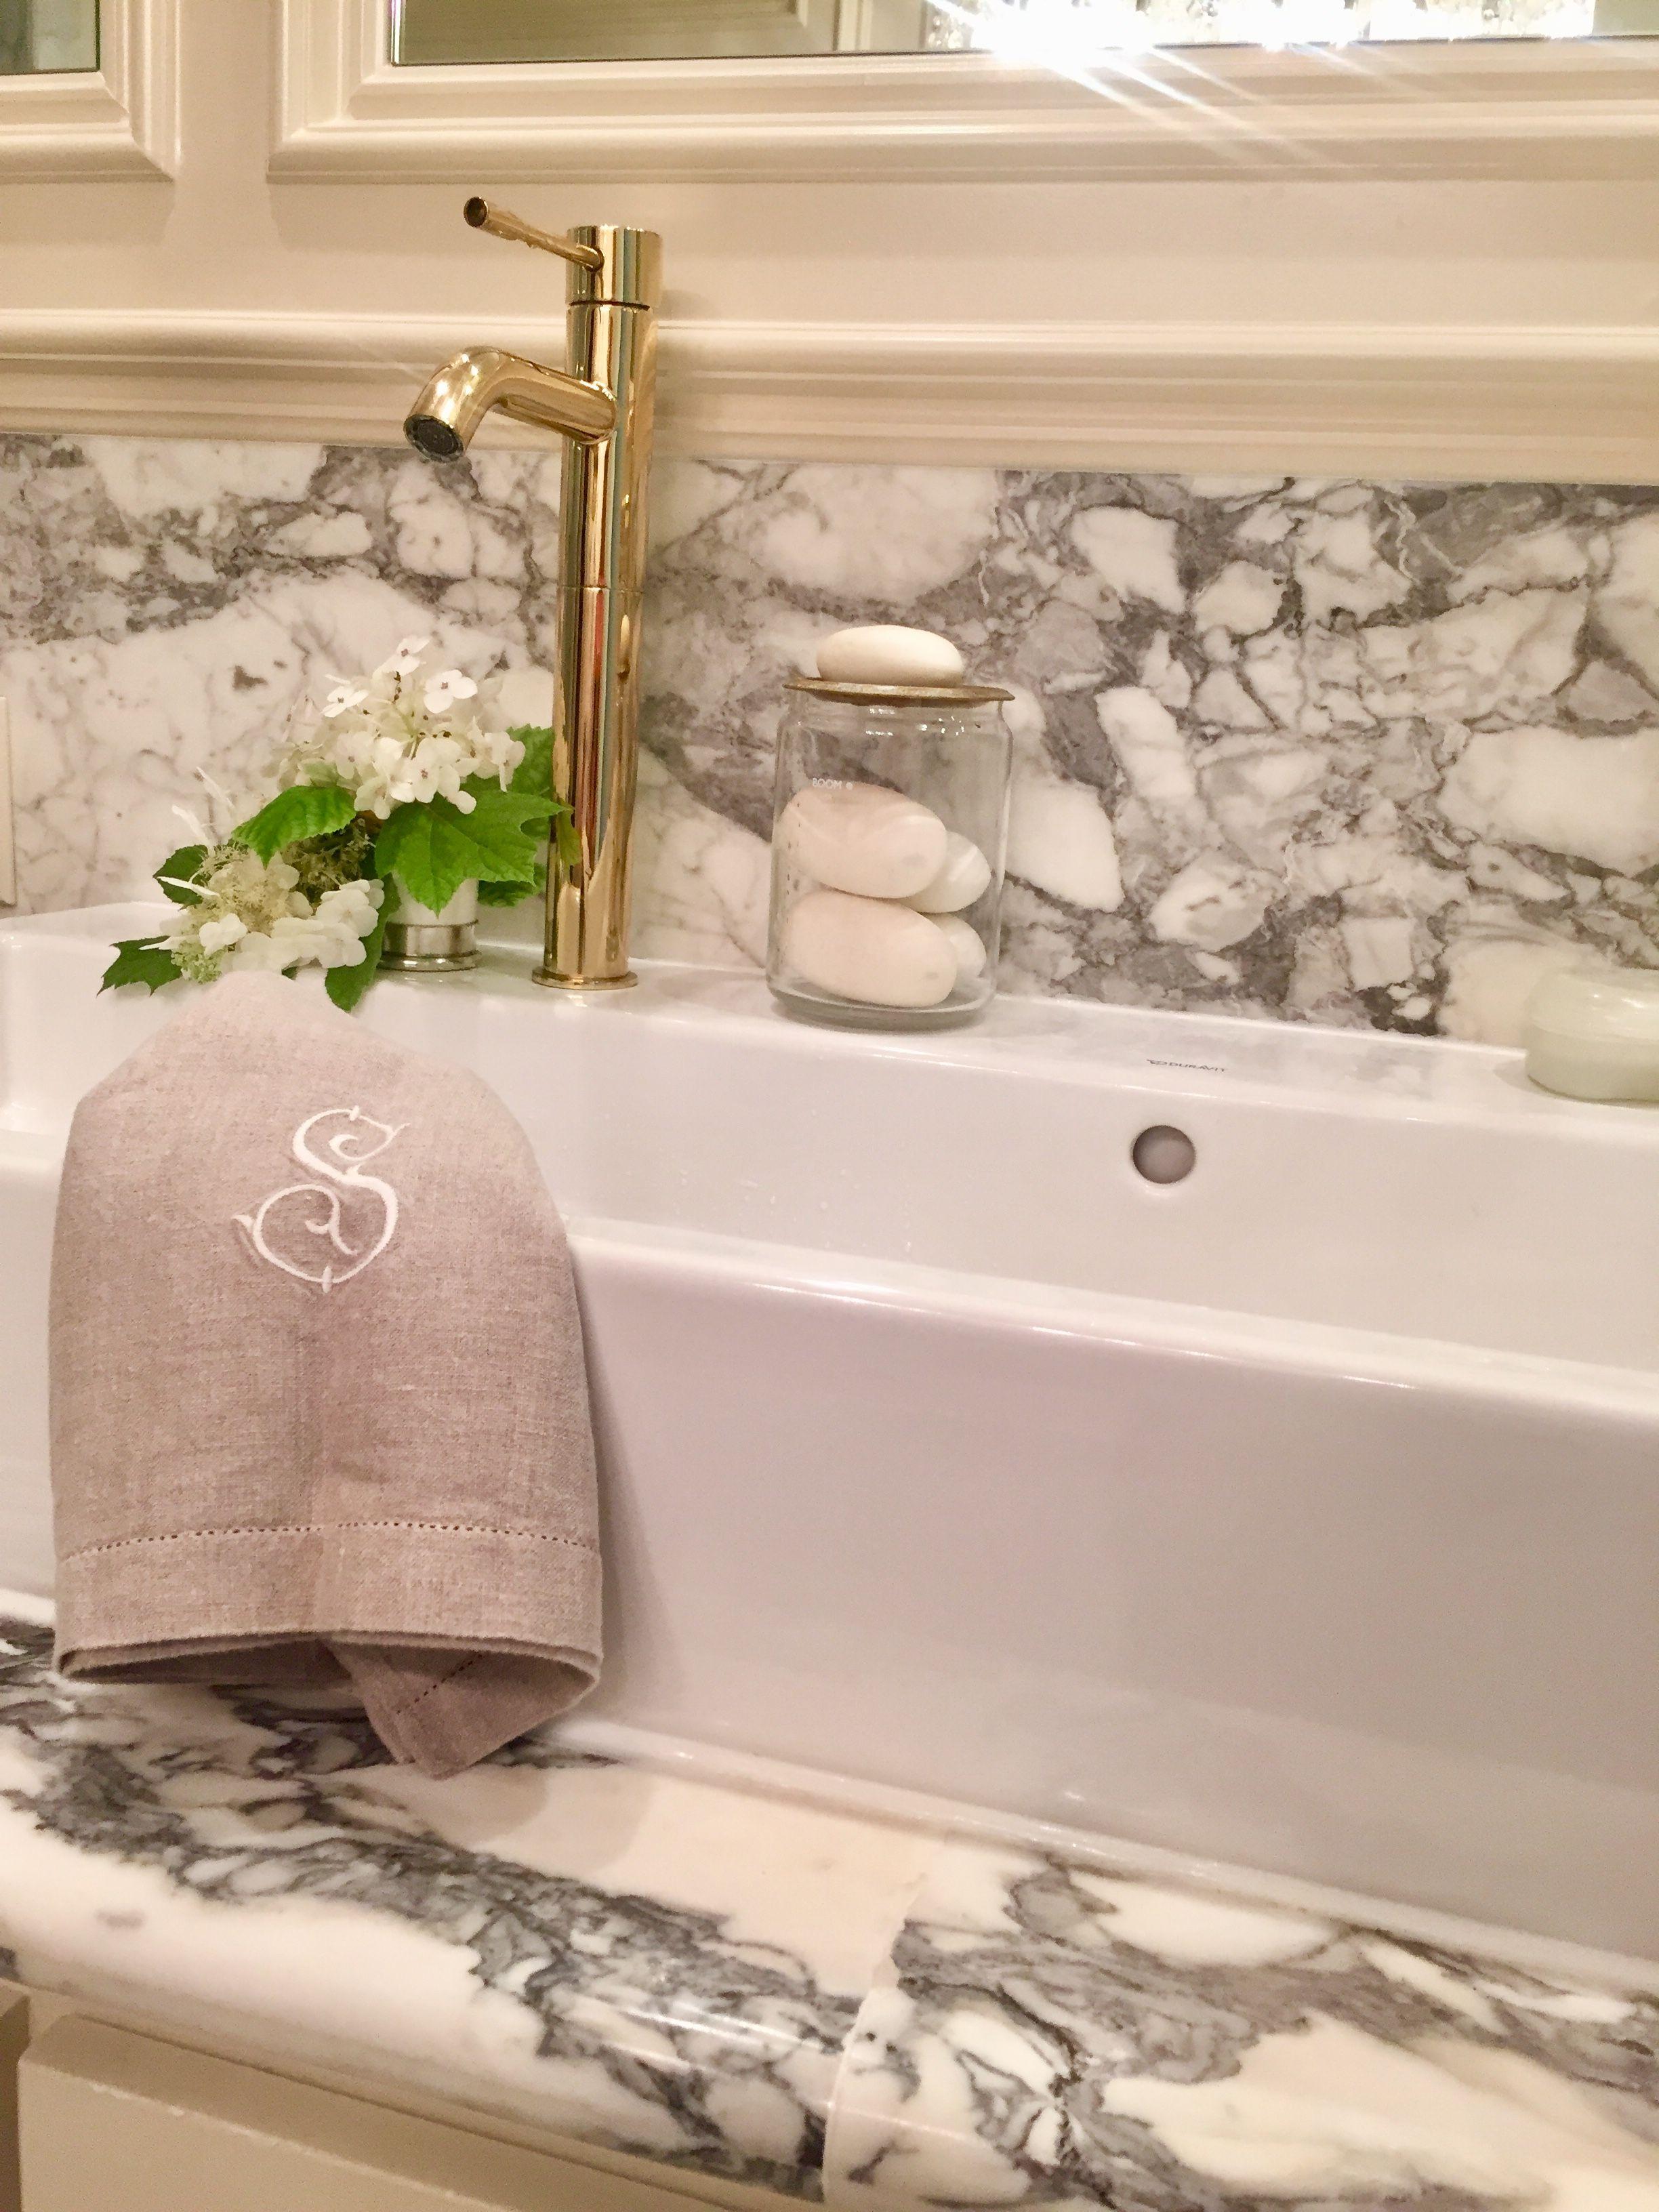 Statuario Marble Slab Back Splash Ligne Crystal Chandelier, Freestanding  Modern Duravit Double Sink And